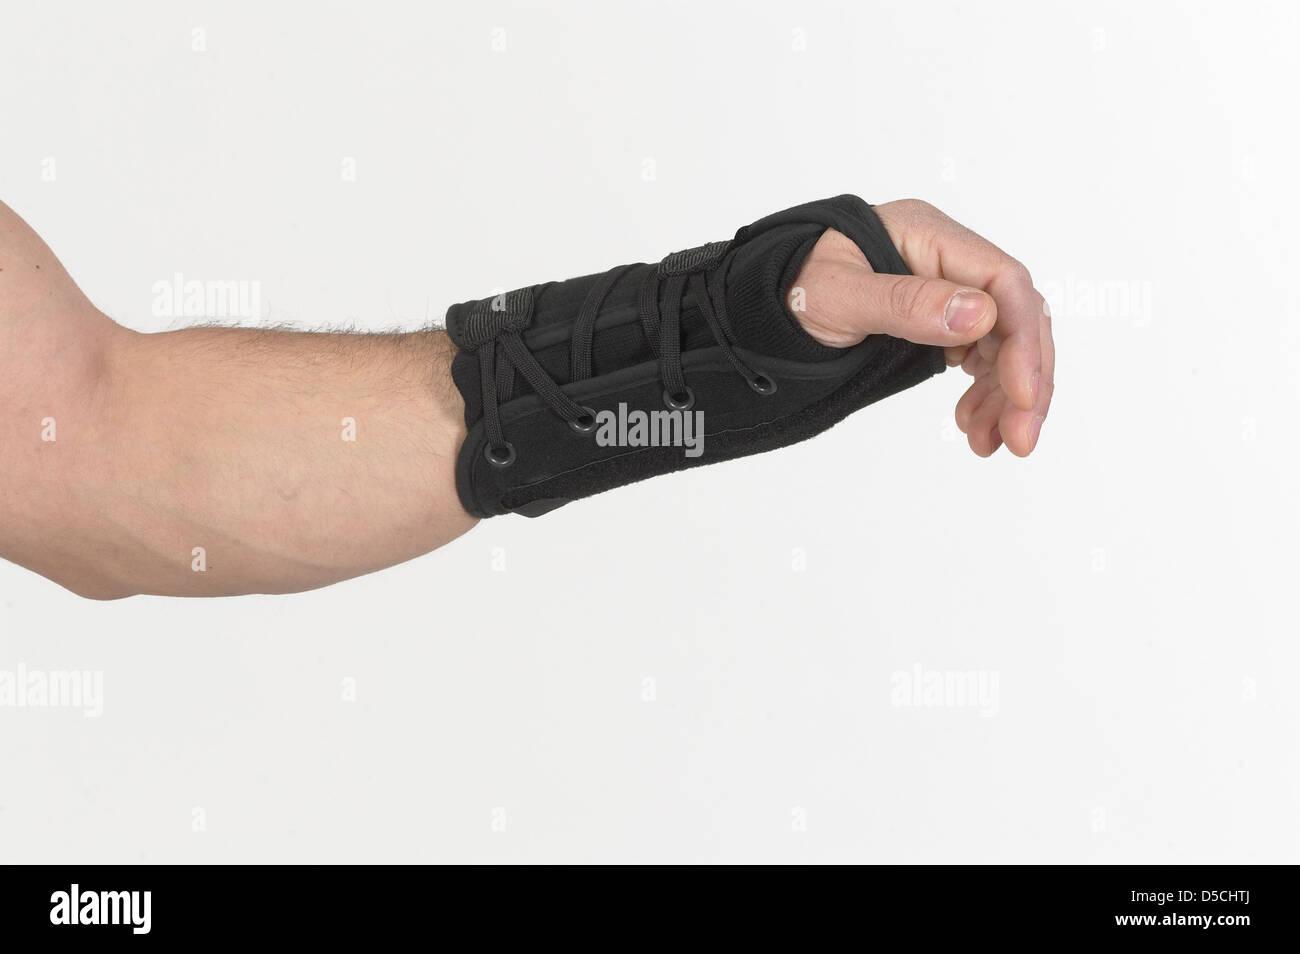 Arm With Broken Wrist & Wrist Brace - Stock Image